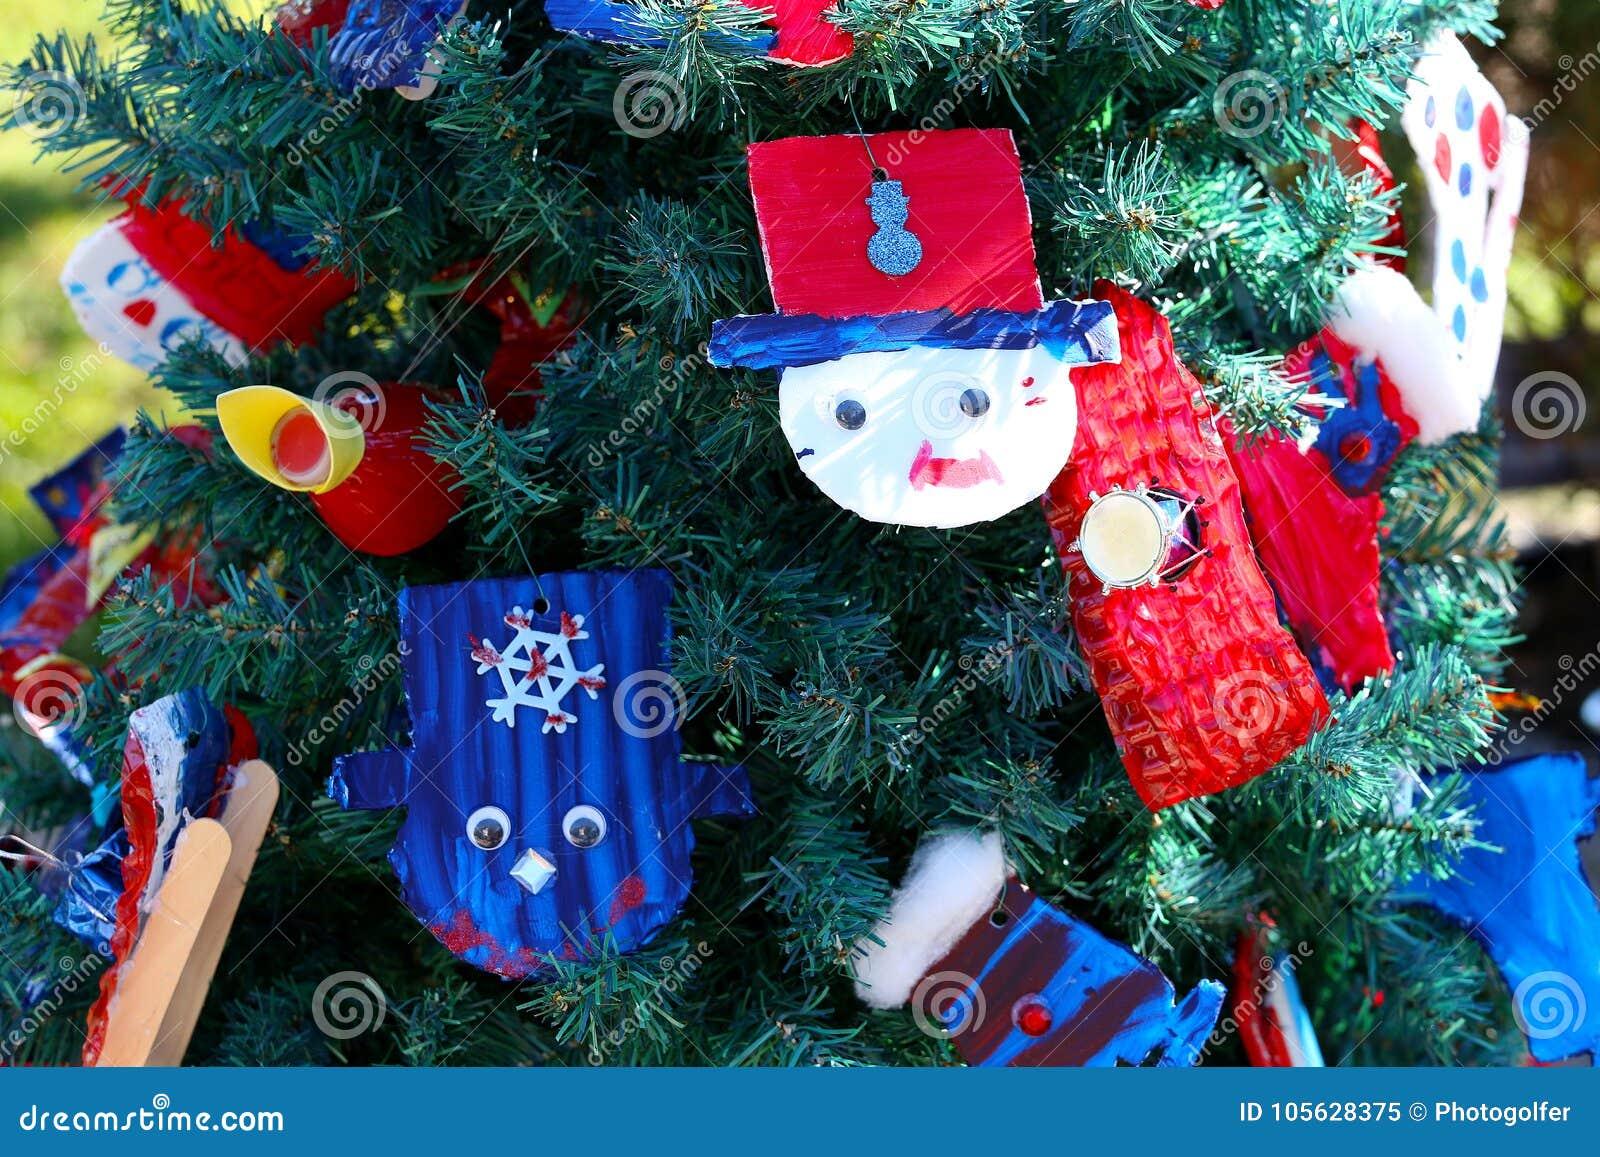 Patriotic Christmas.Patriotic Christmas Tree In Fort Myers Florida Usa Stock